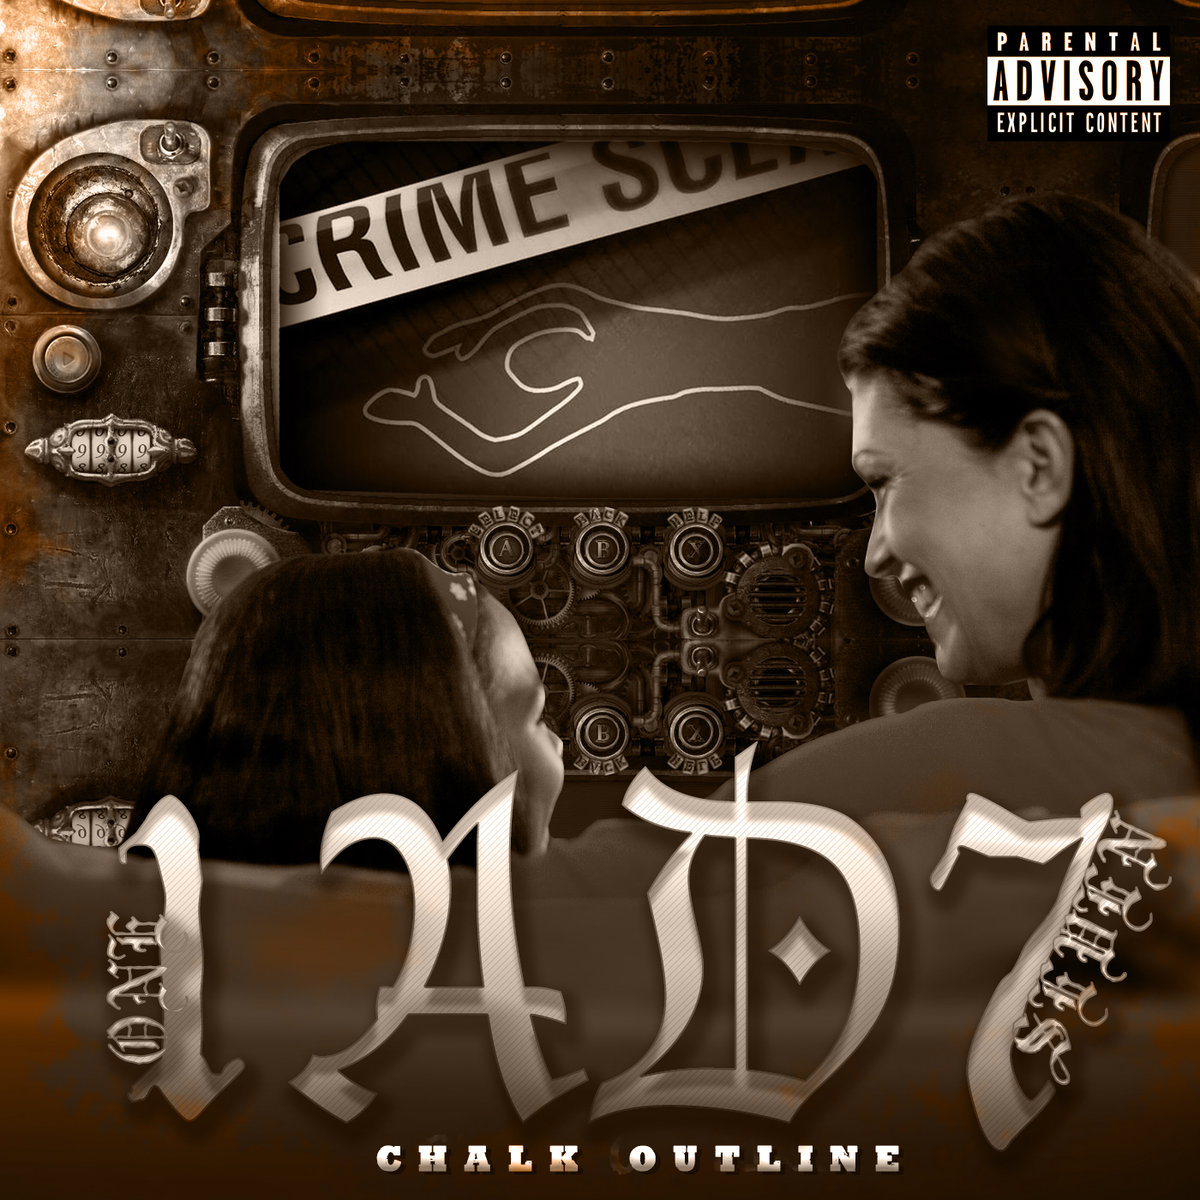 Lyrics video of the song: chalk outline three days grace (lyrics.